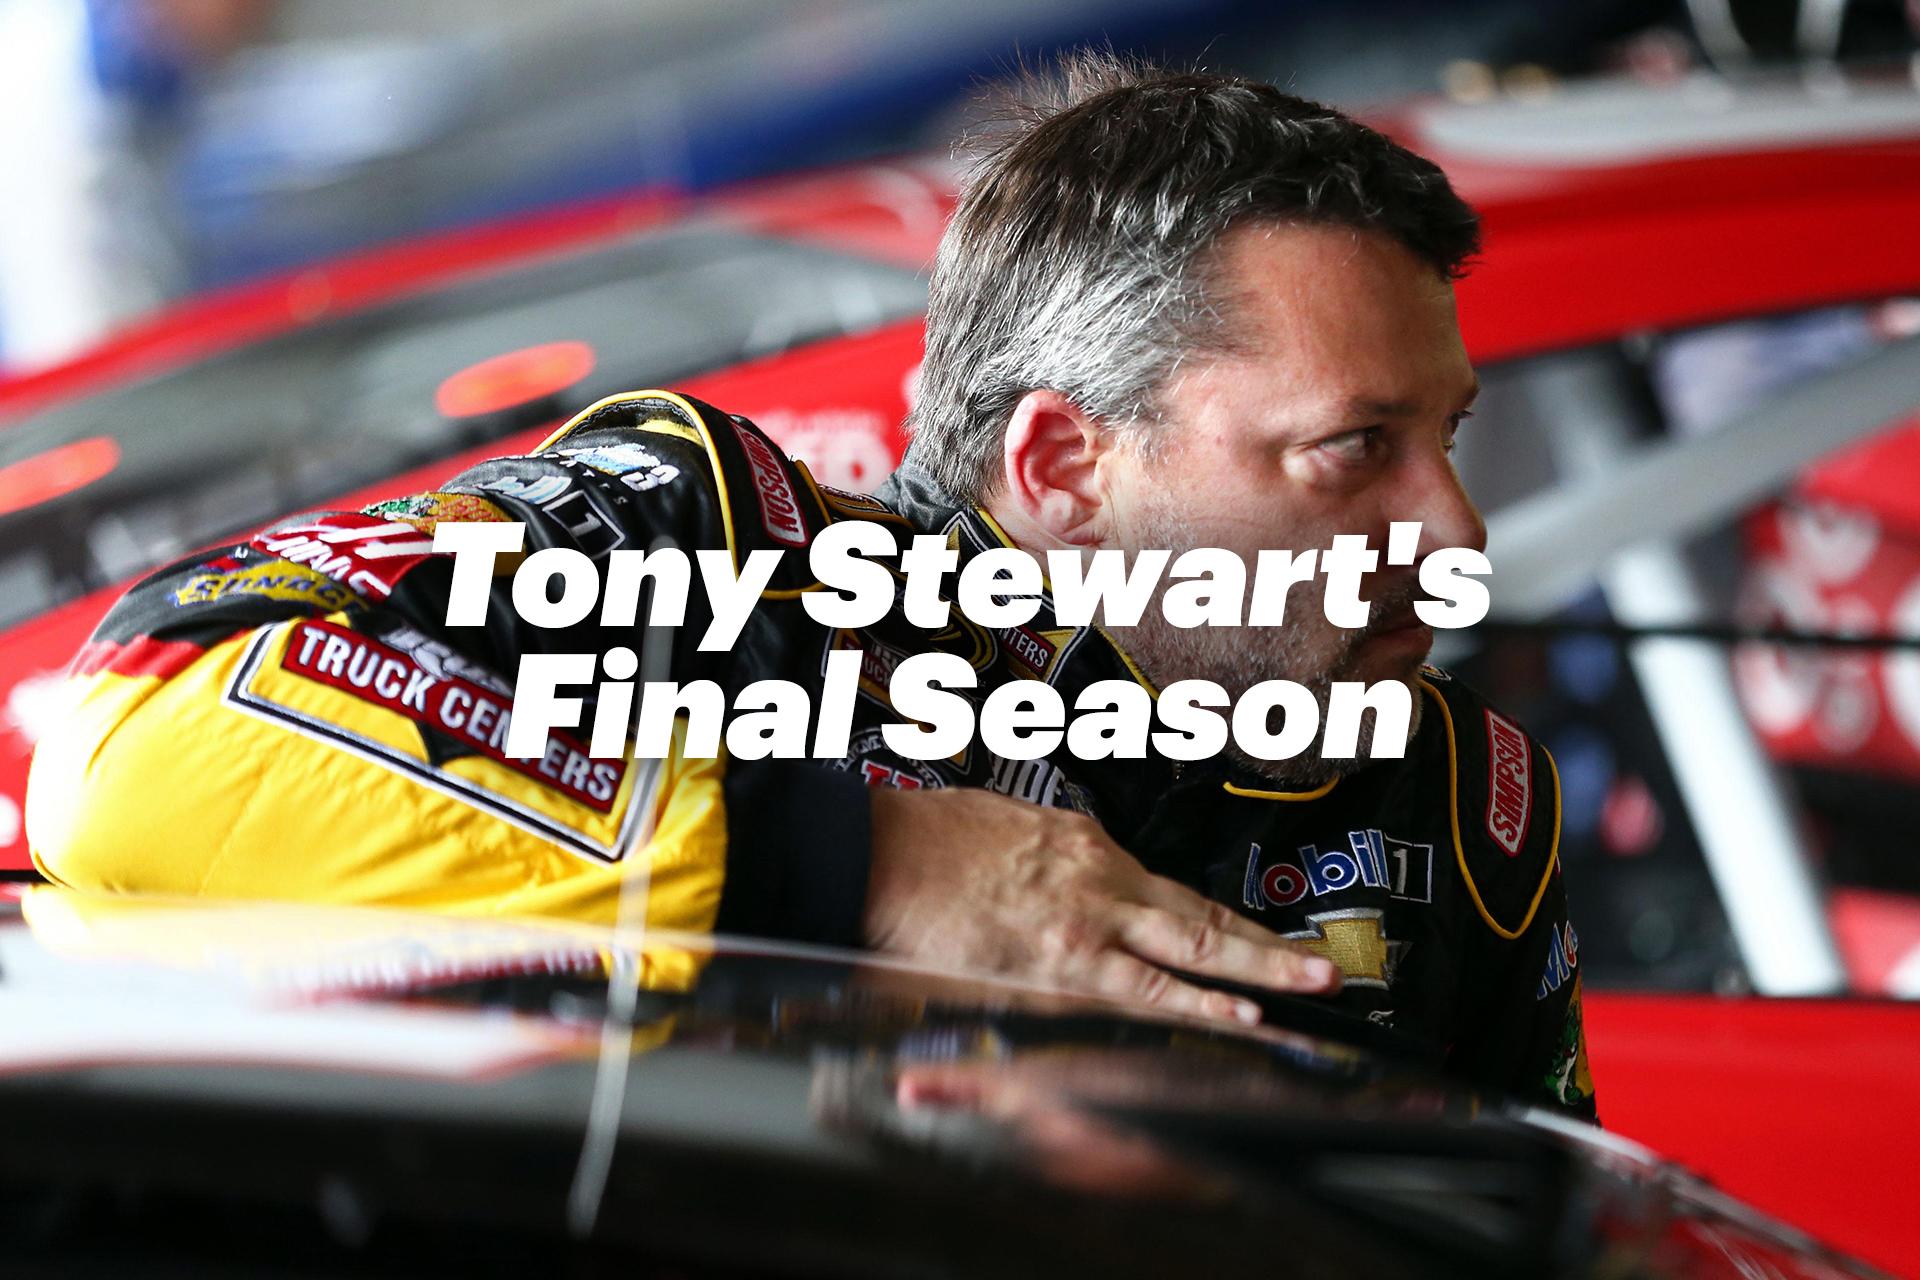 TonyStewart